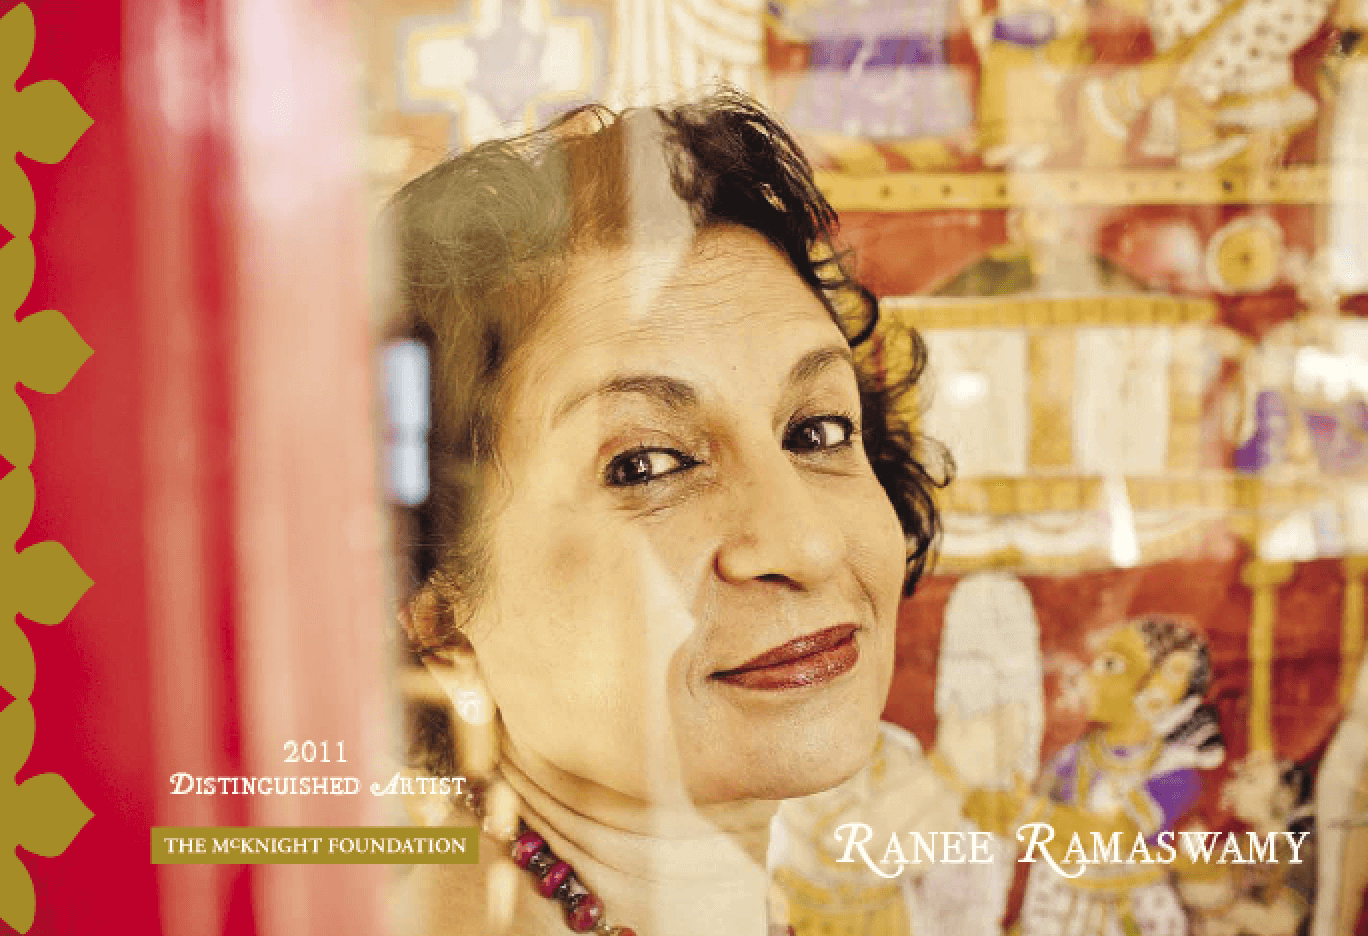 Ranee Ramaswamy: 2011 Distinguished Artist